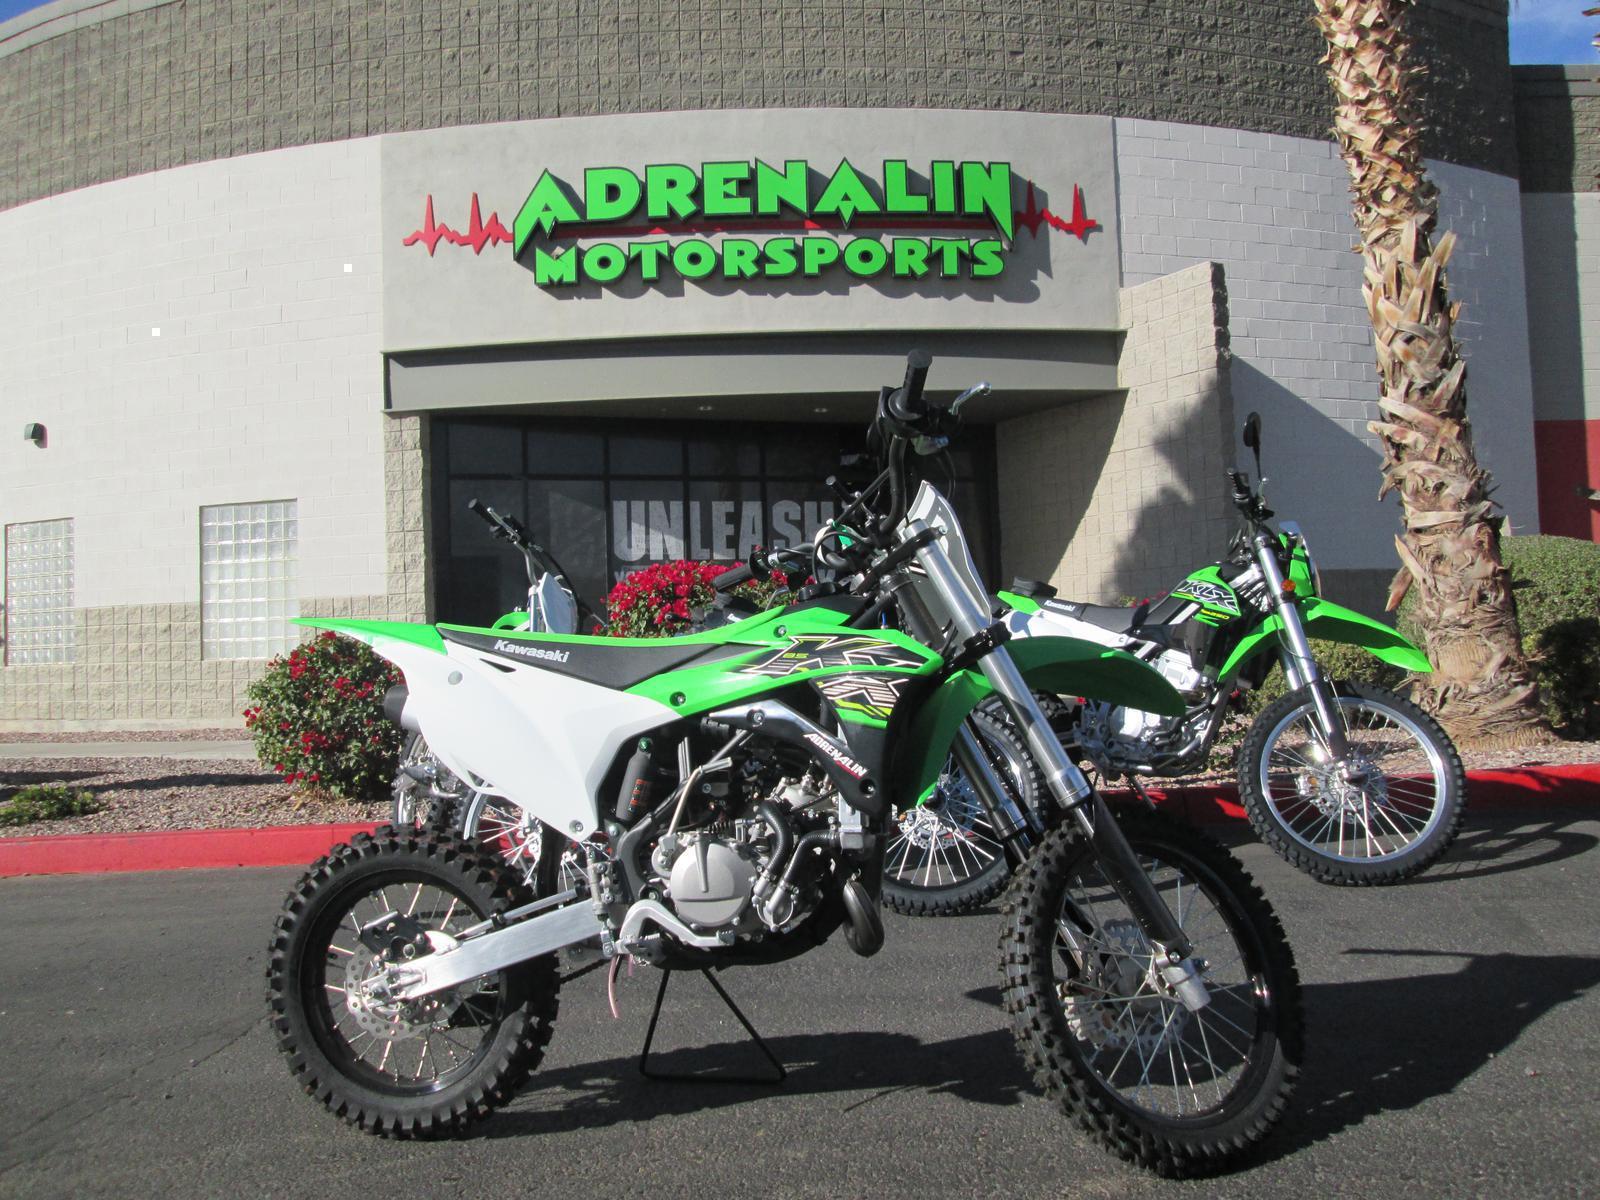 Dirt Bikes from Kawasaki Adrenalin Motorsports Casa Grande, AZ (520